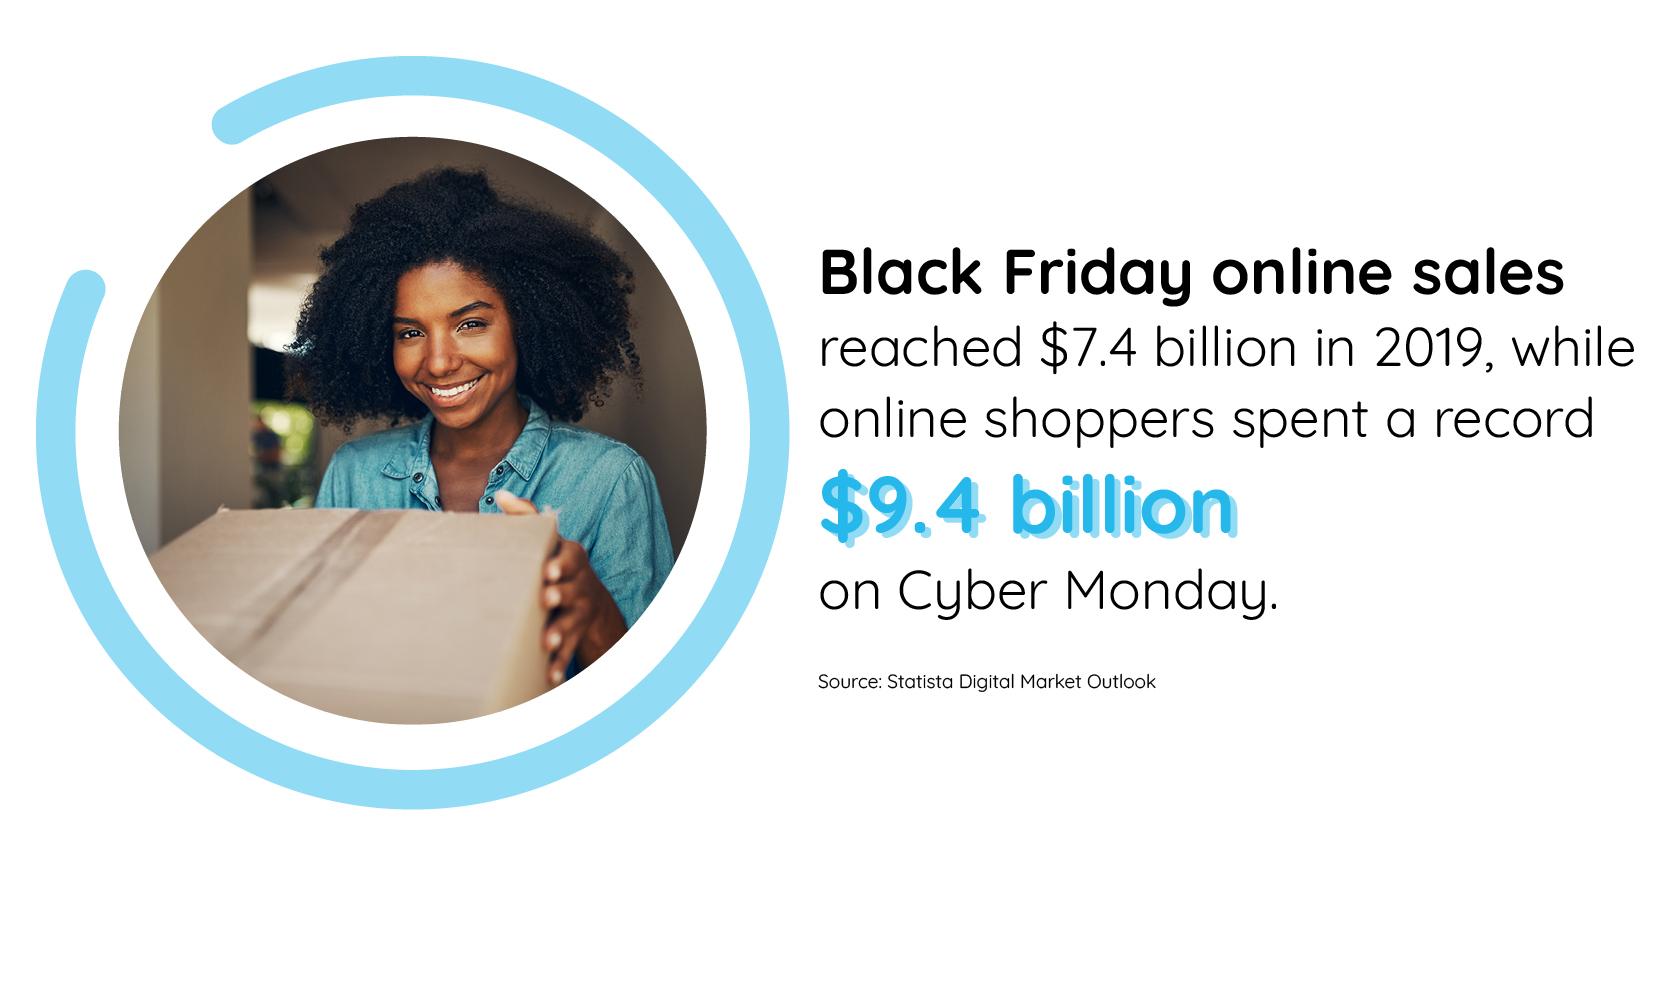 Black Friday Online Sales